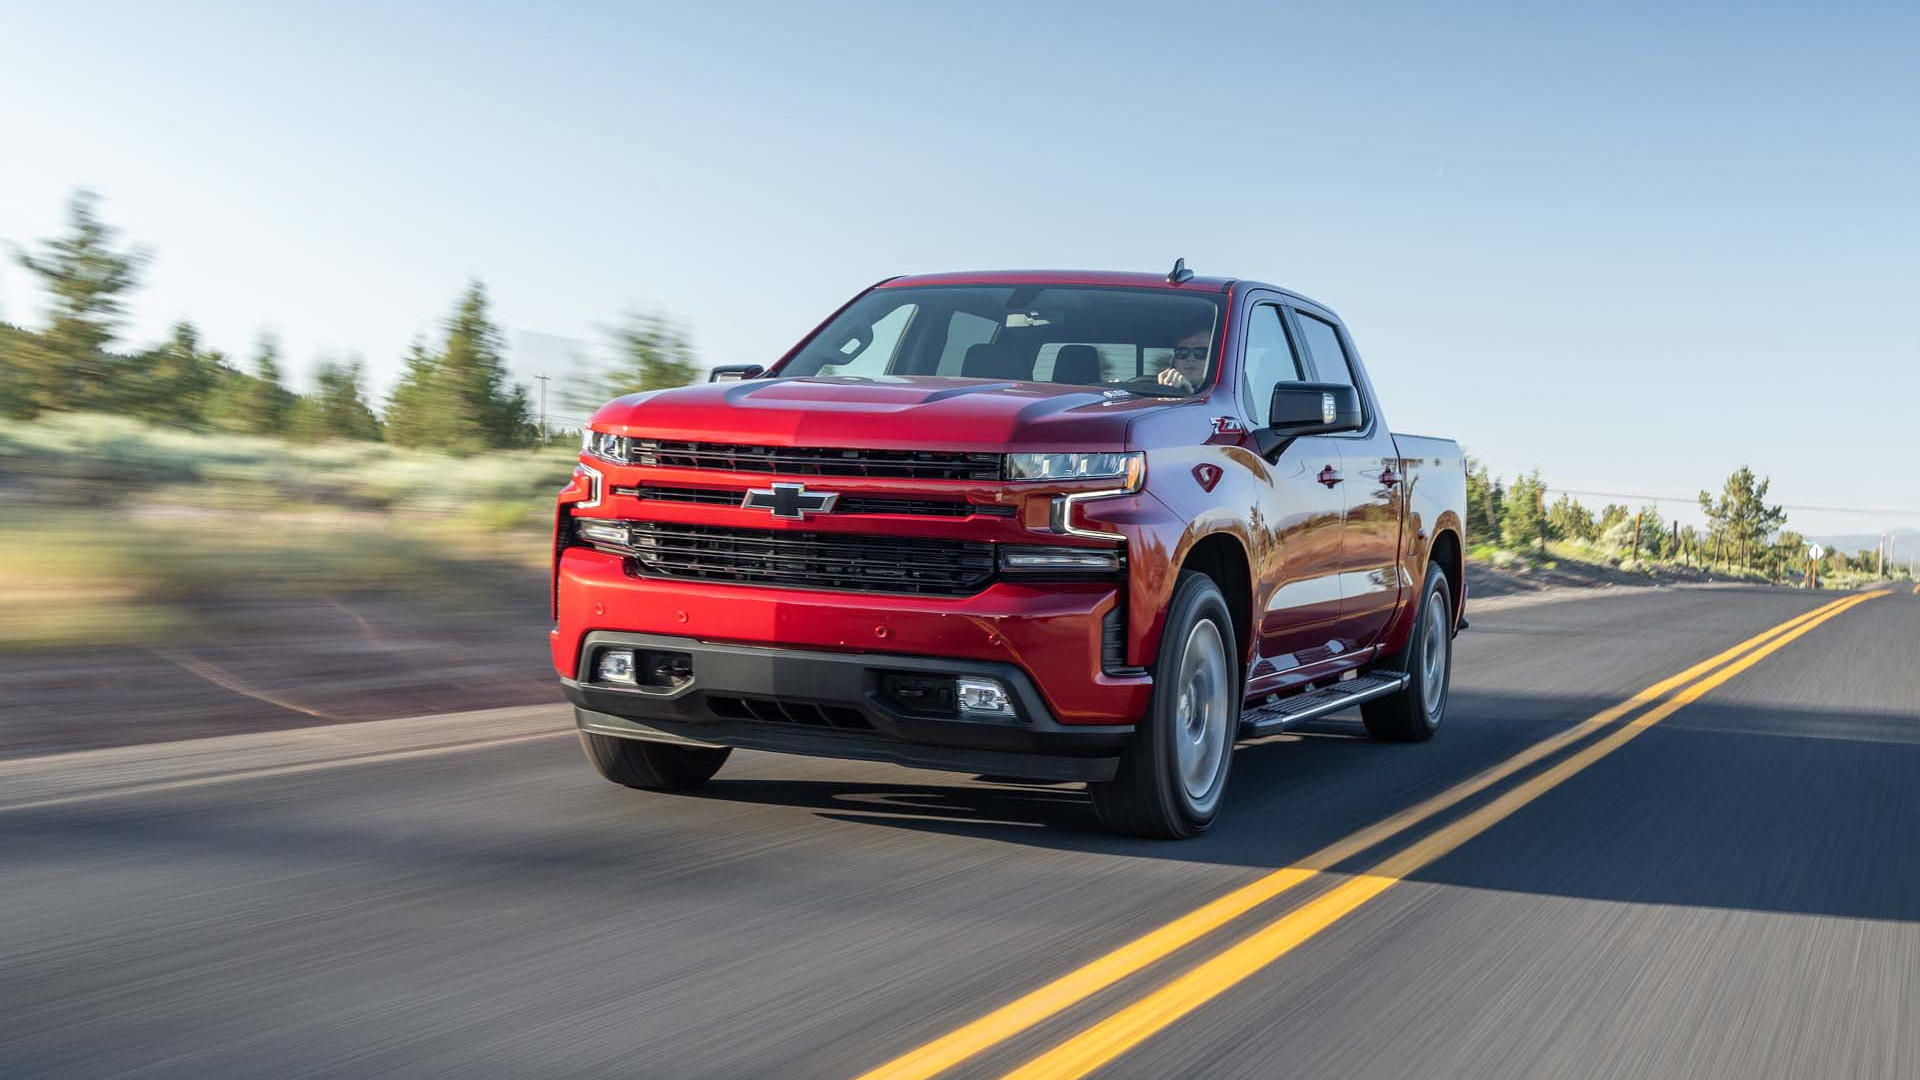 Chevrolet News - Green Car Photos, News, Reviews, and